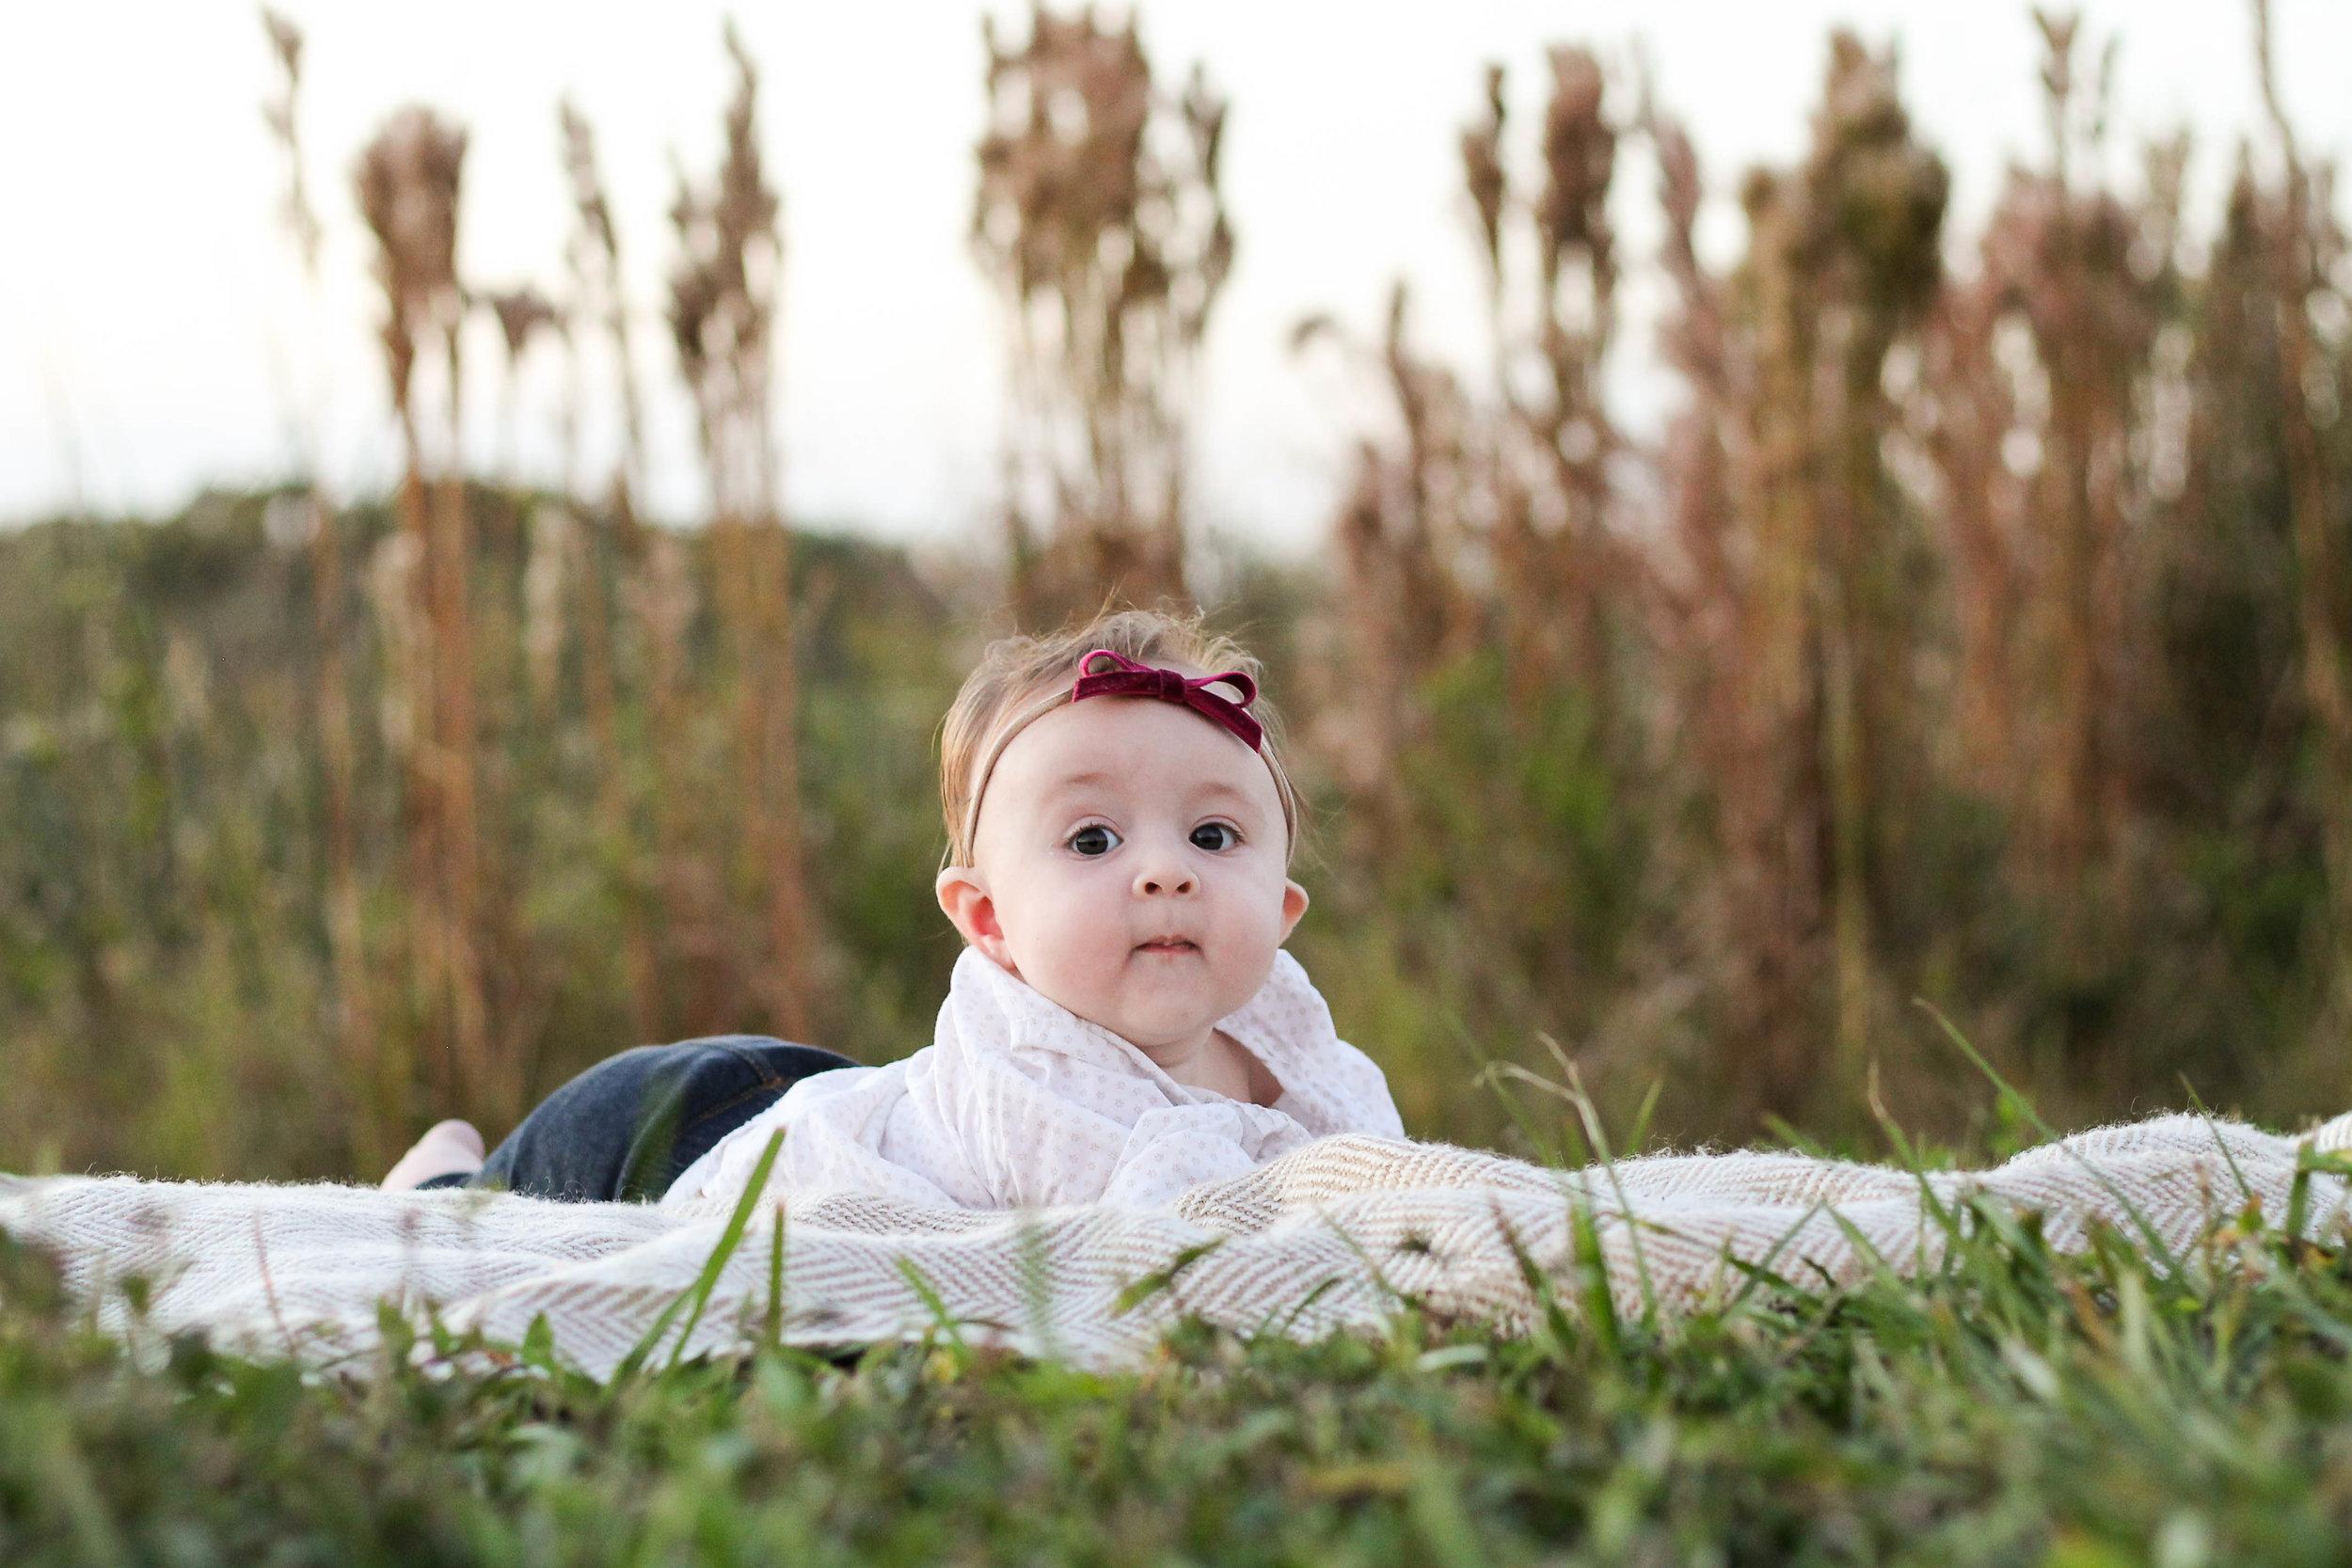 Eleanora Joy, 6 months old